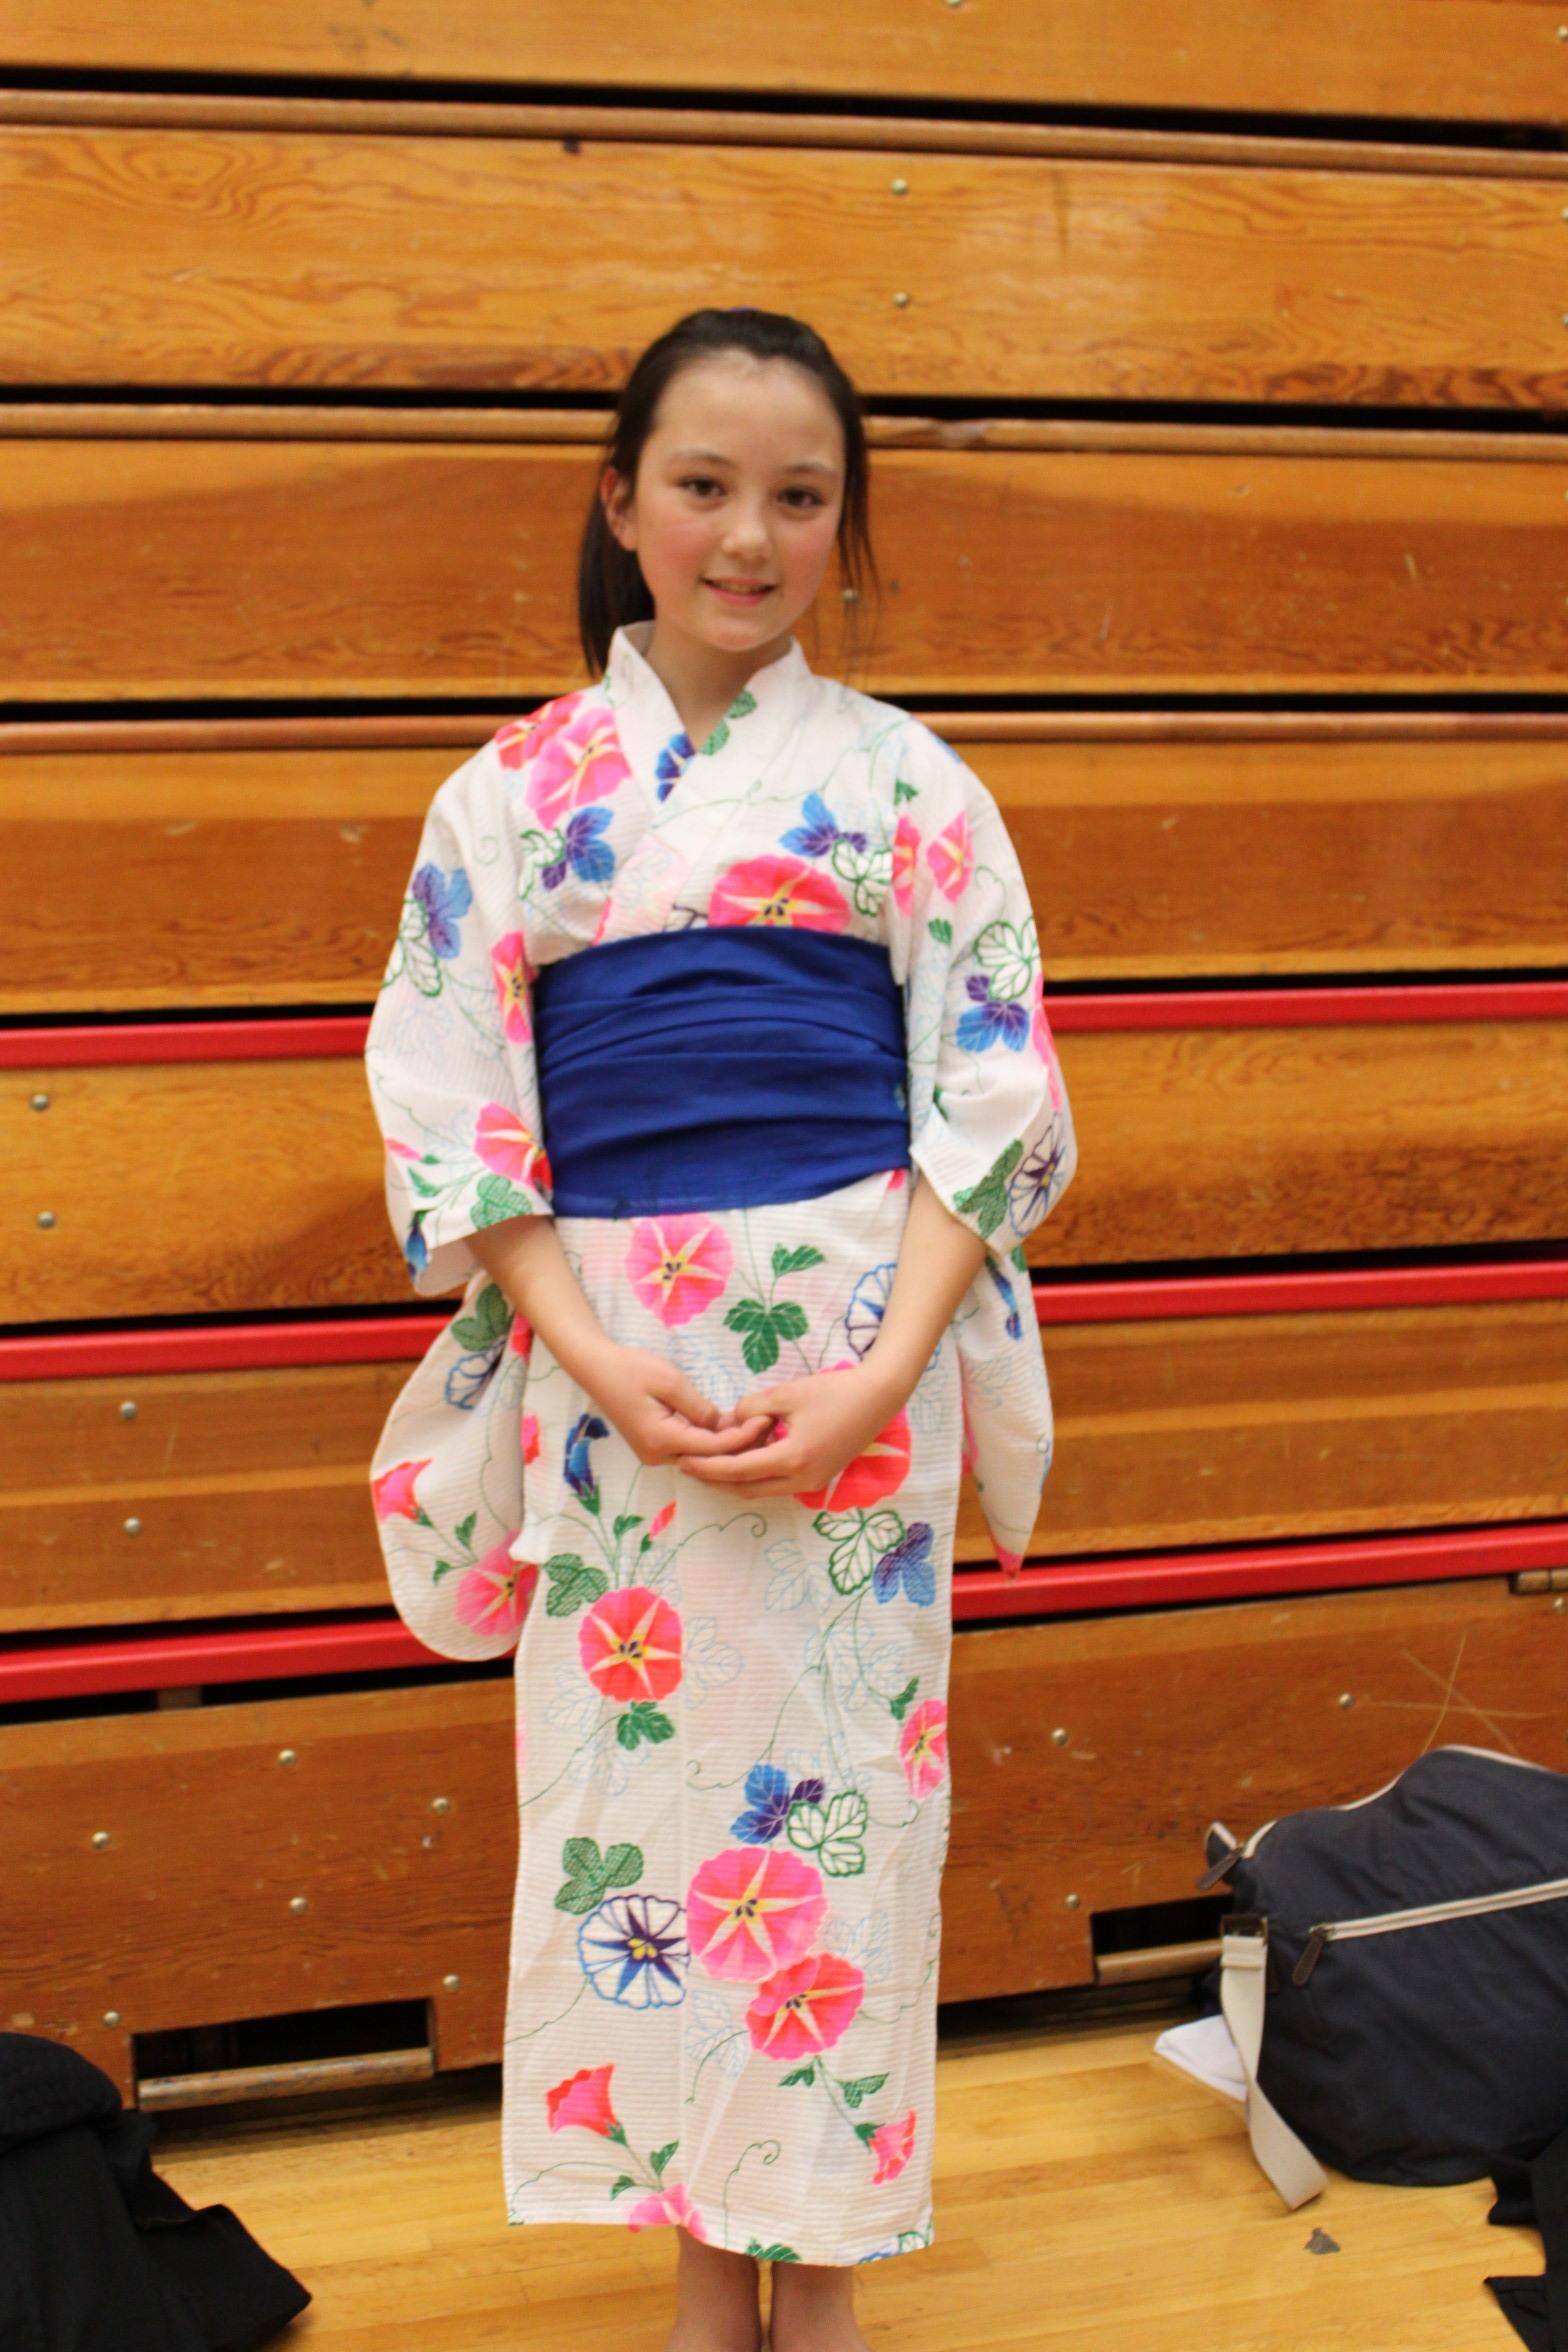 Jenna Phillips at age 9 wearing a yukata at a Japanese festival.